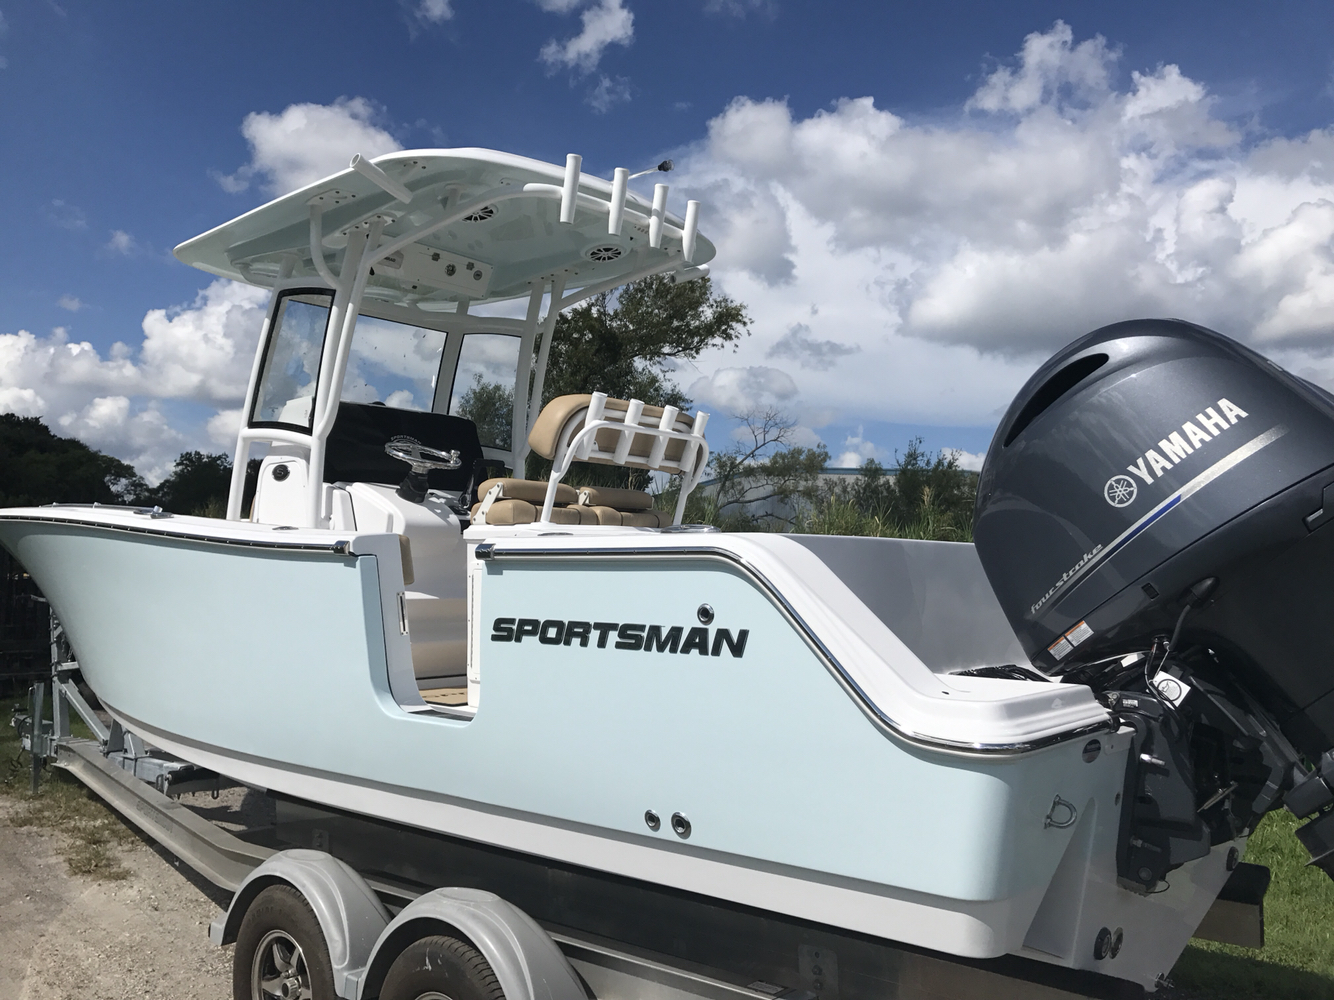 Sportsman Boats Heritage 251